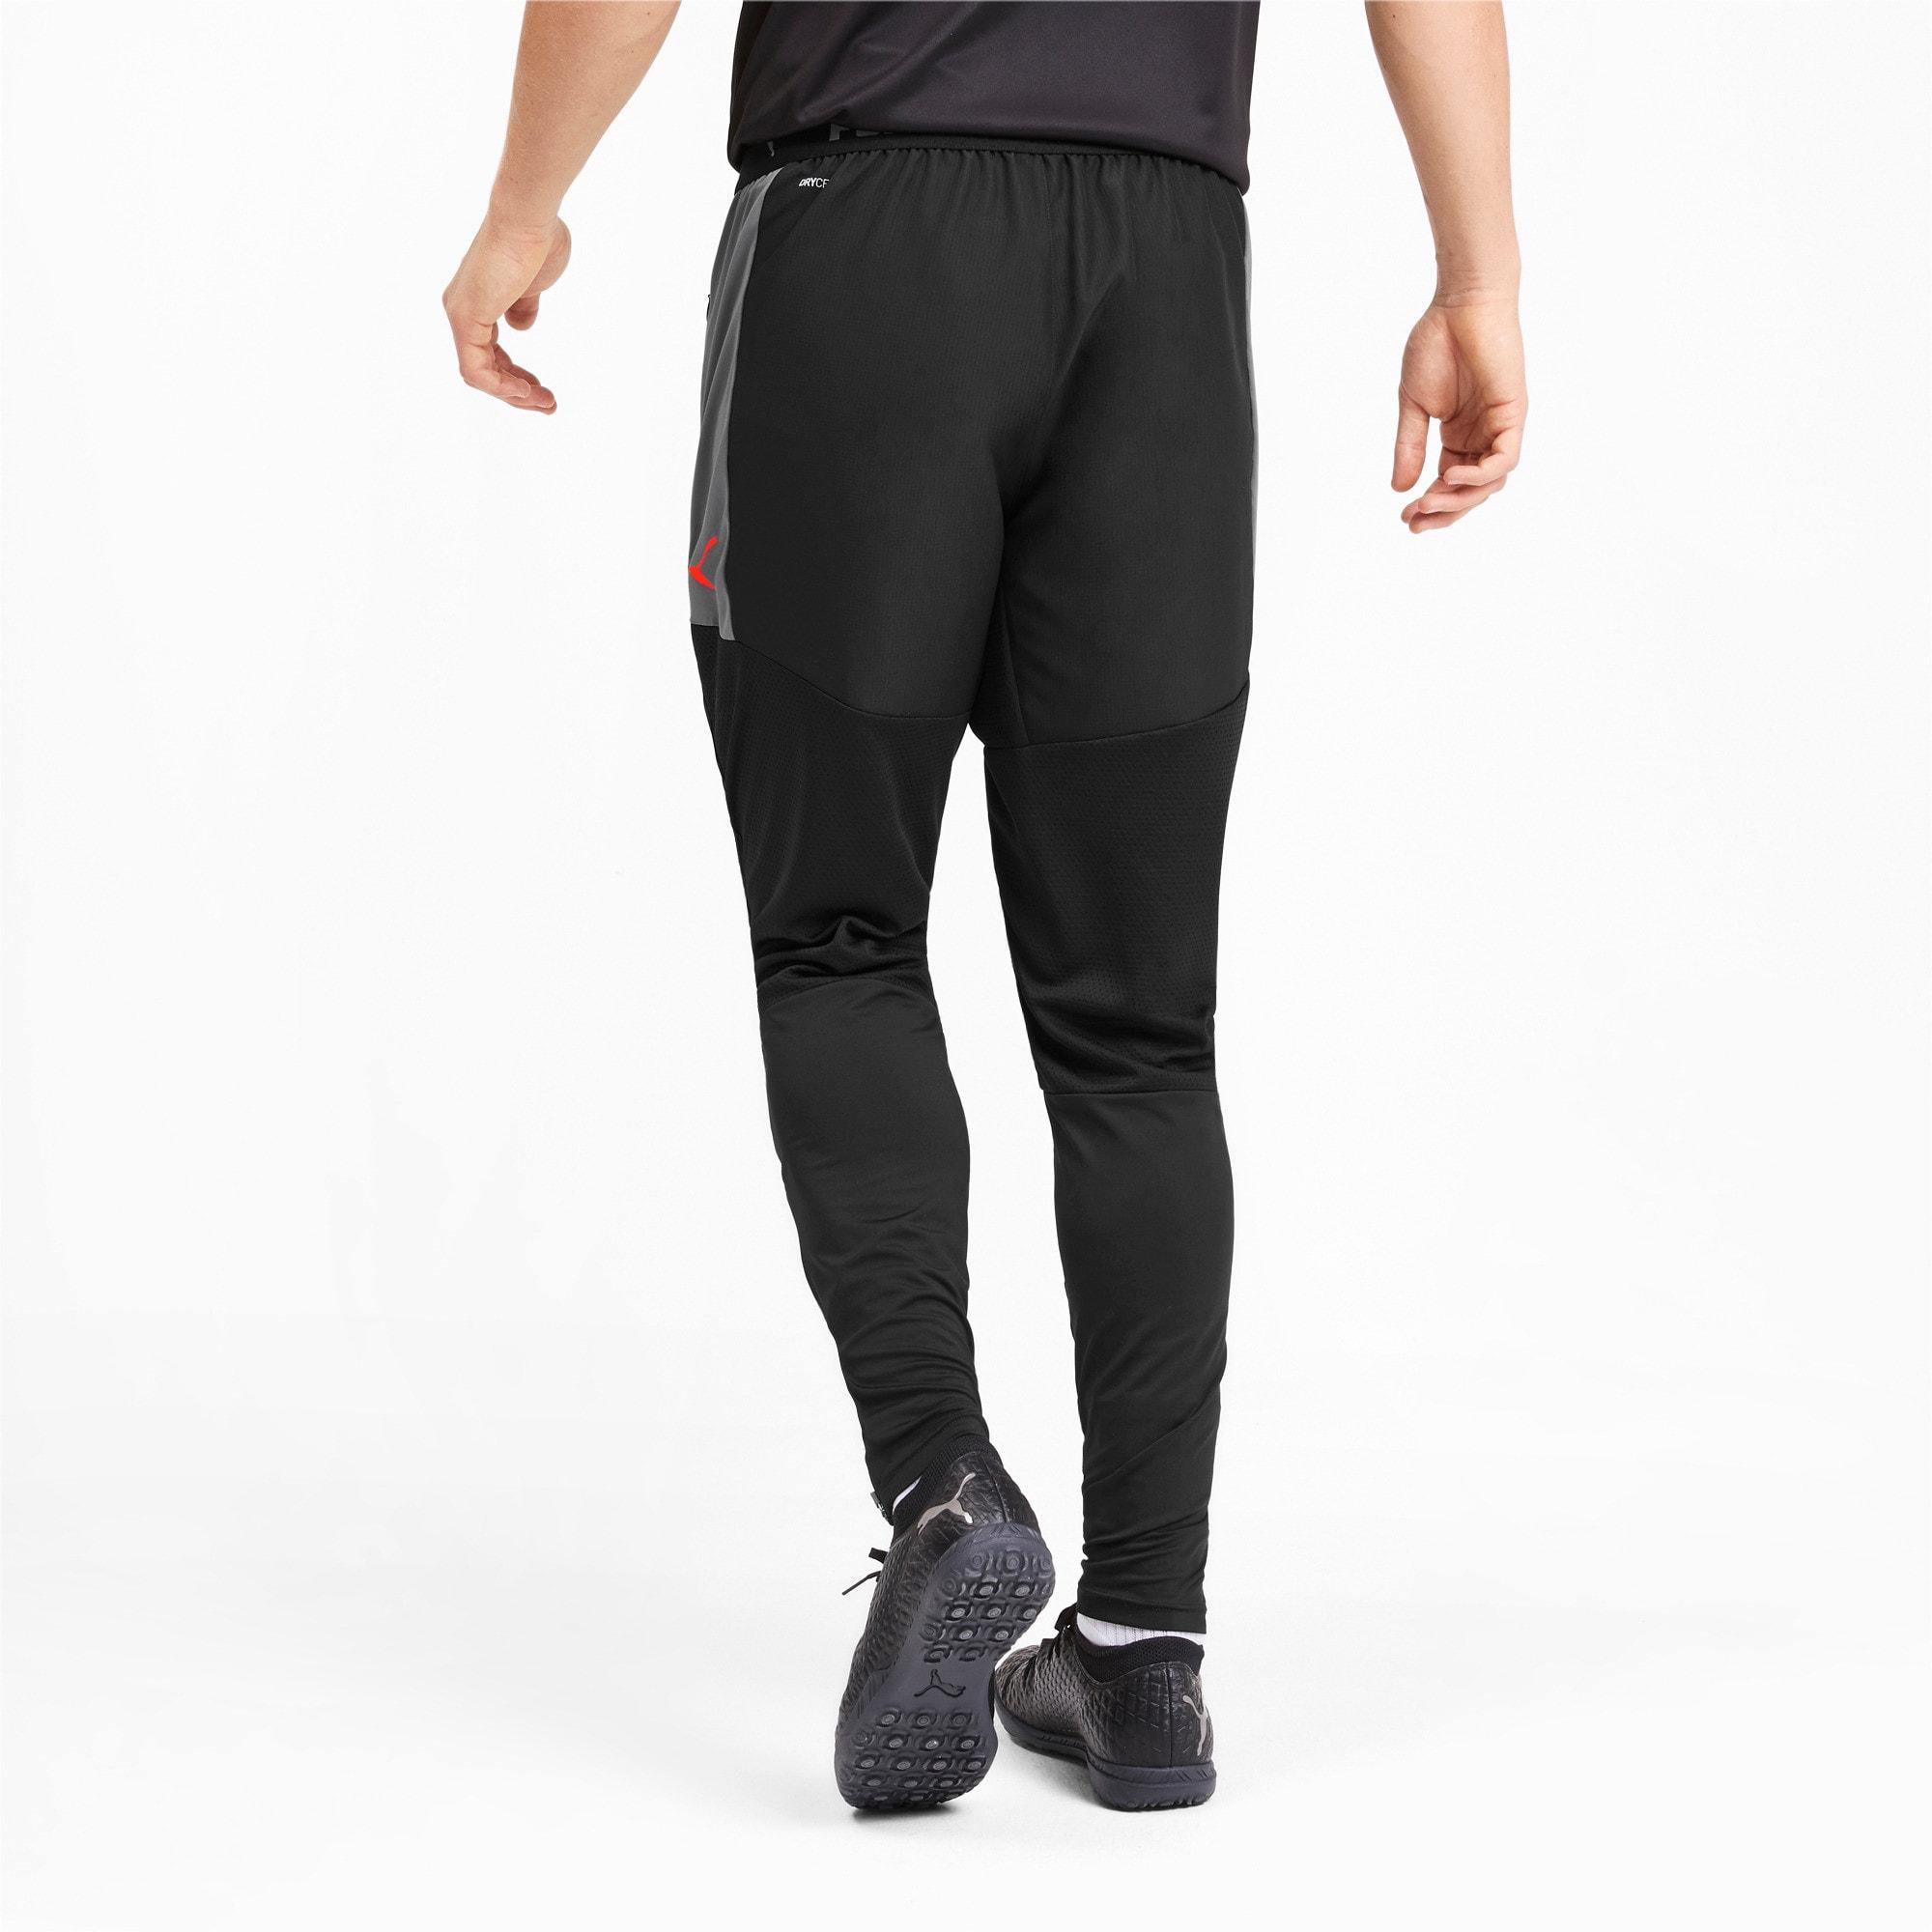 Thumbnail 2 of ftblNXT Men's Pro Pants, Puma Black-Nrgy Red, medium